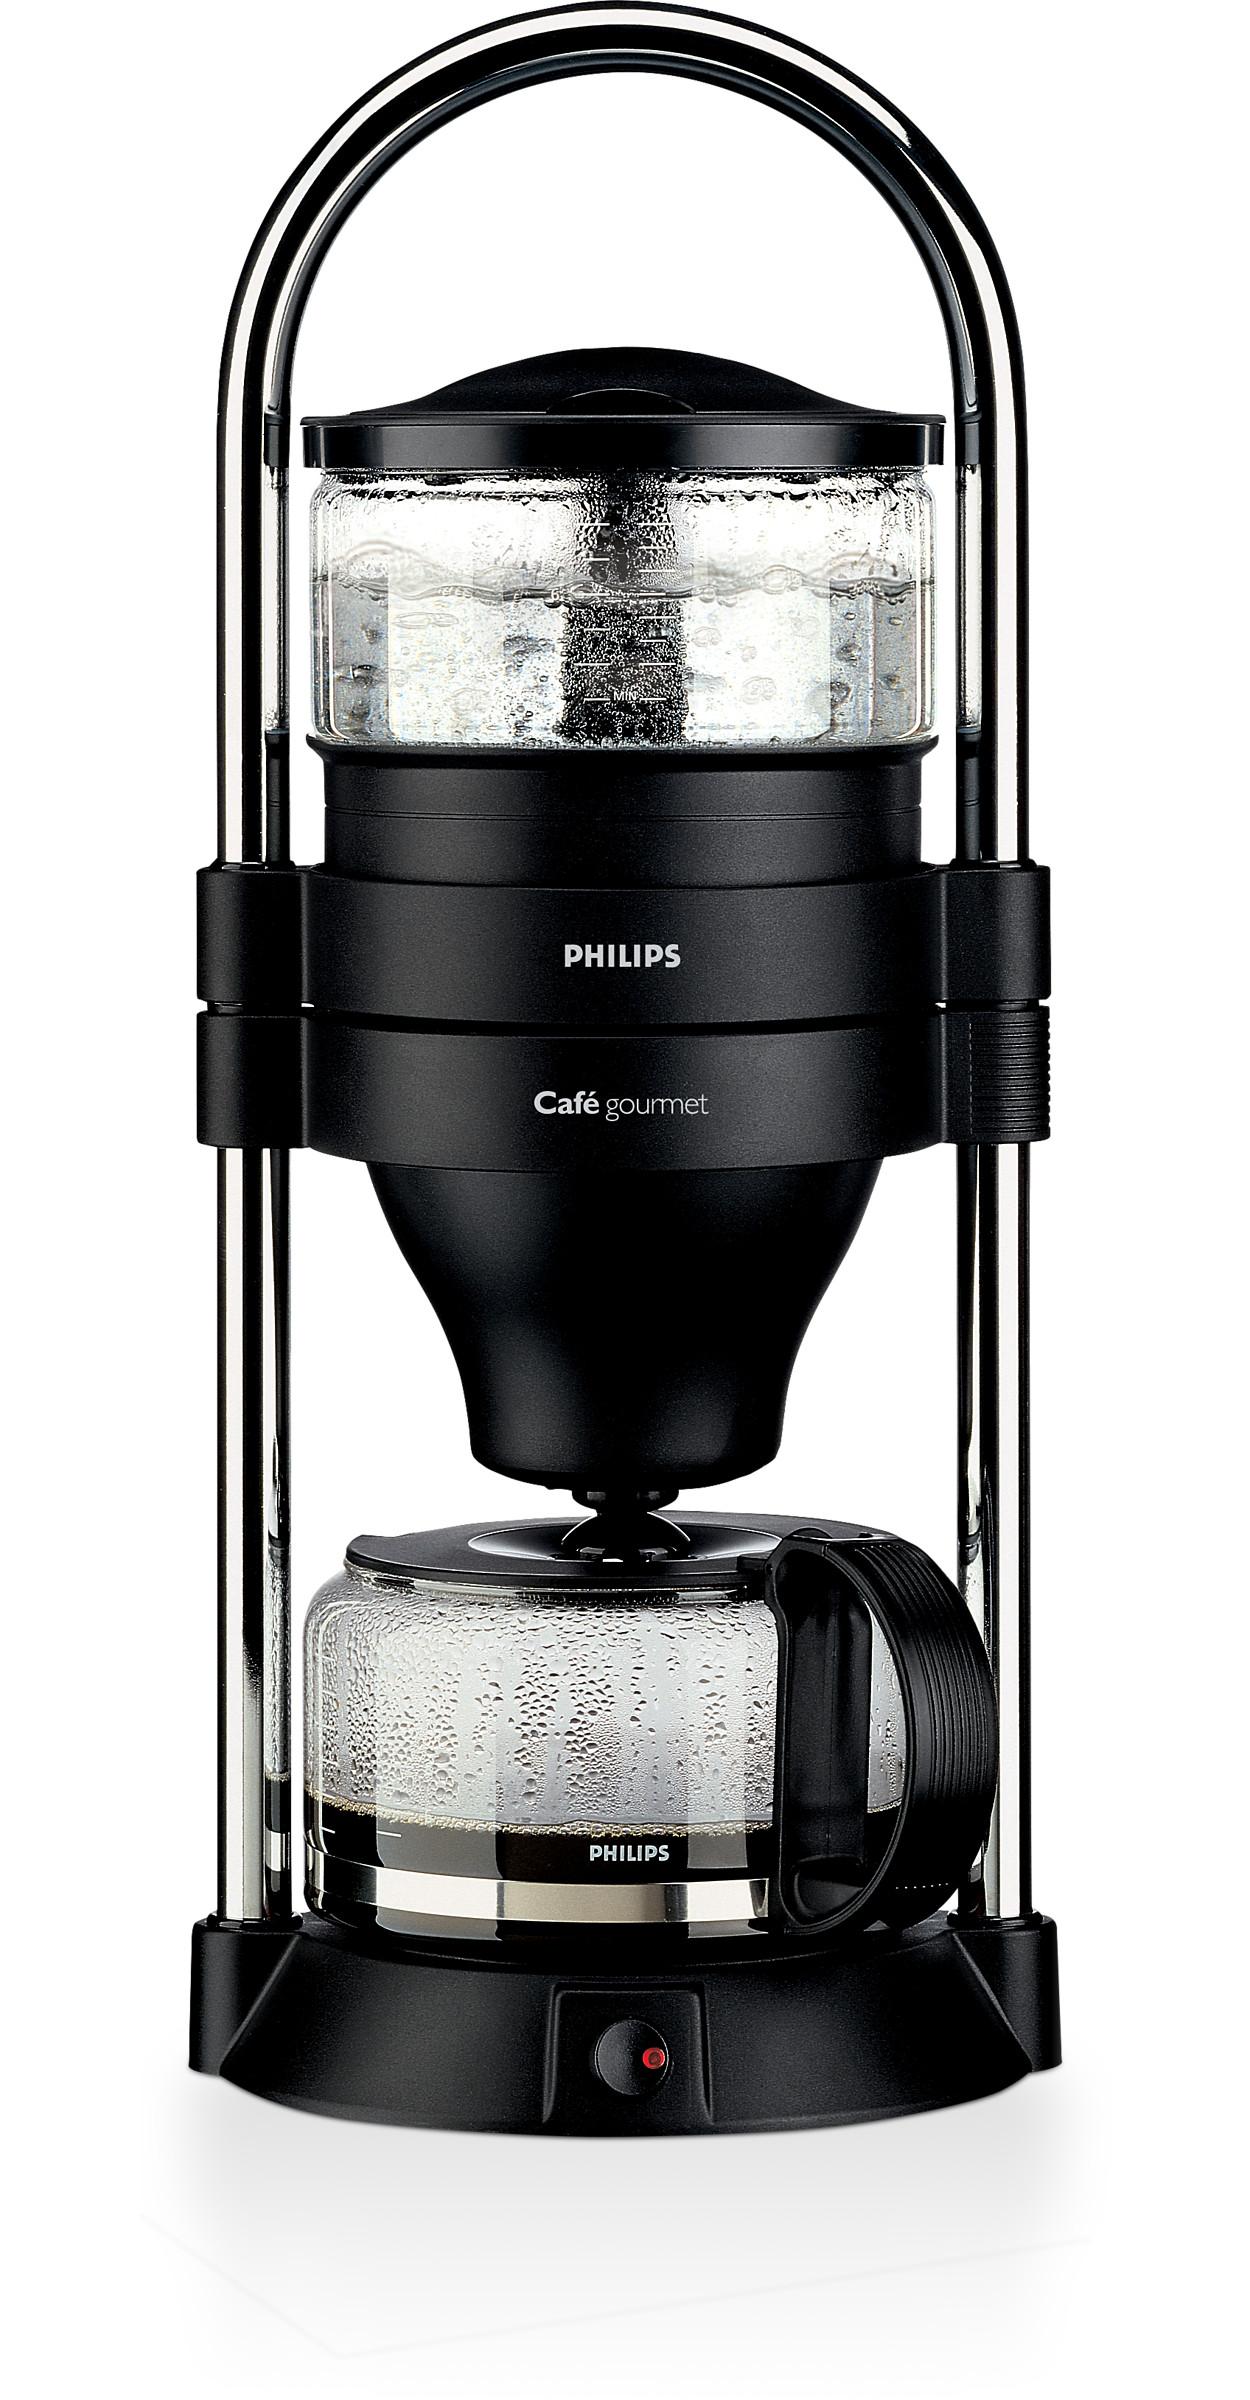 caf gourmet kaffeemaschine hd5405 60 philips. Black Bedroom Furniture Sets. Home Design Ideas